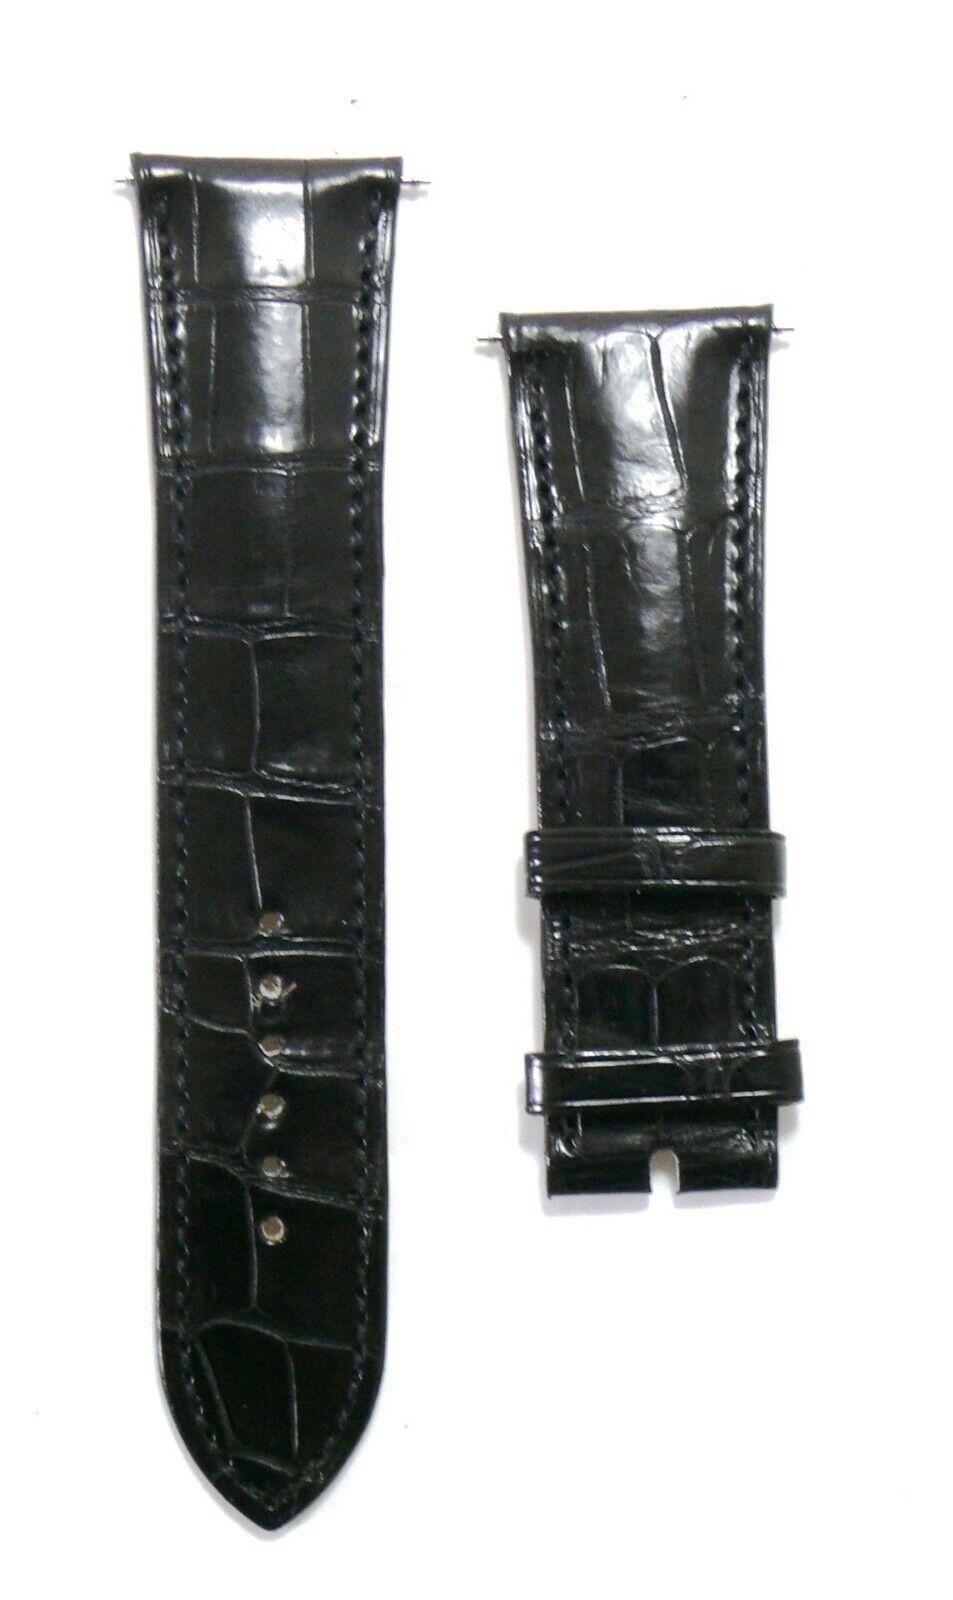 Genuine Parmigiani Fleurier Hermes Black Crocodile Leather Watch Strap NEW 33310